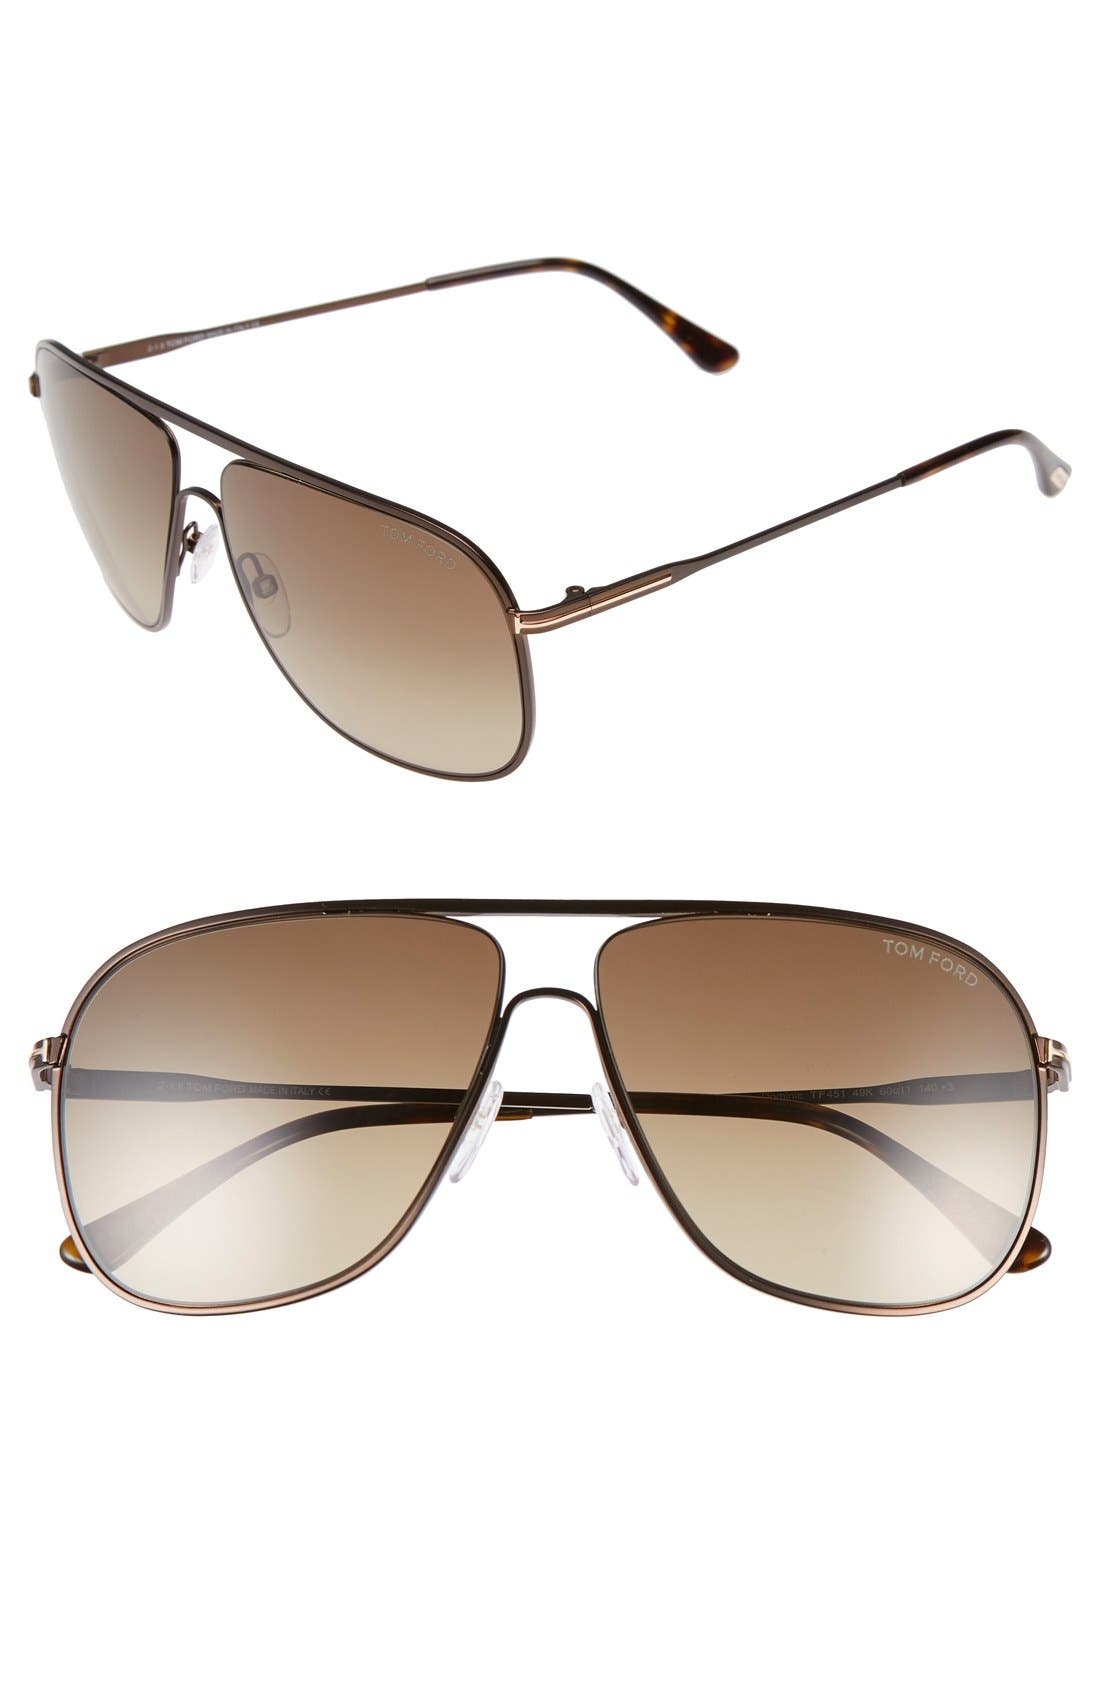 60mm Matte Aviator Sunglasses,                             Main thumbnail 1, color,                             240